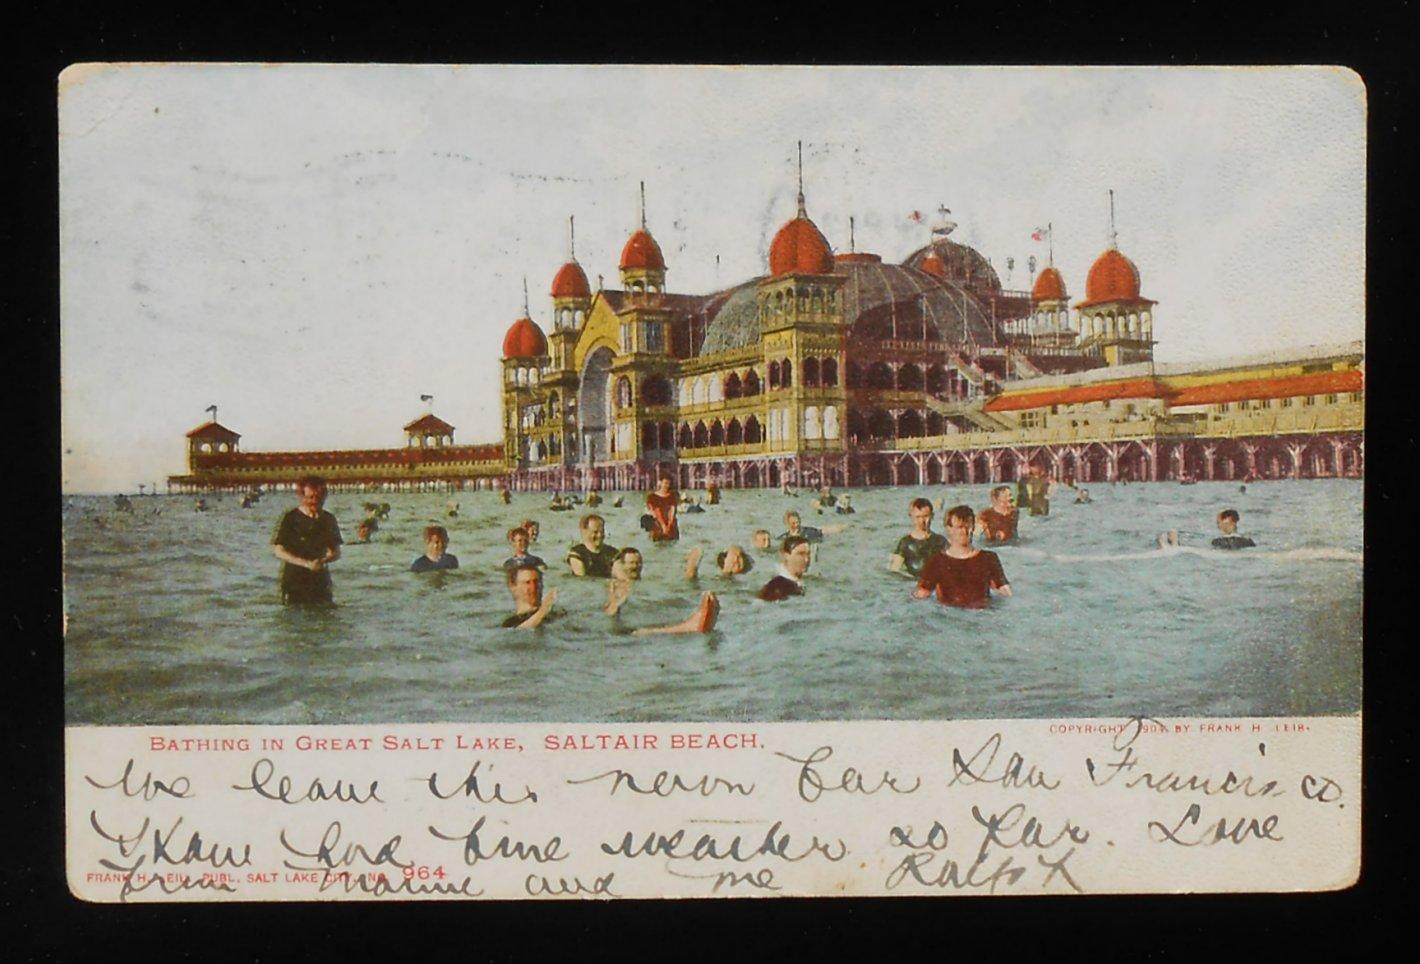 1906 Bathing In Great Salt Lake Saltair Beach Salt Lake City UT Salt Lake Co PC